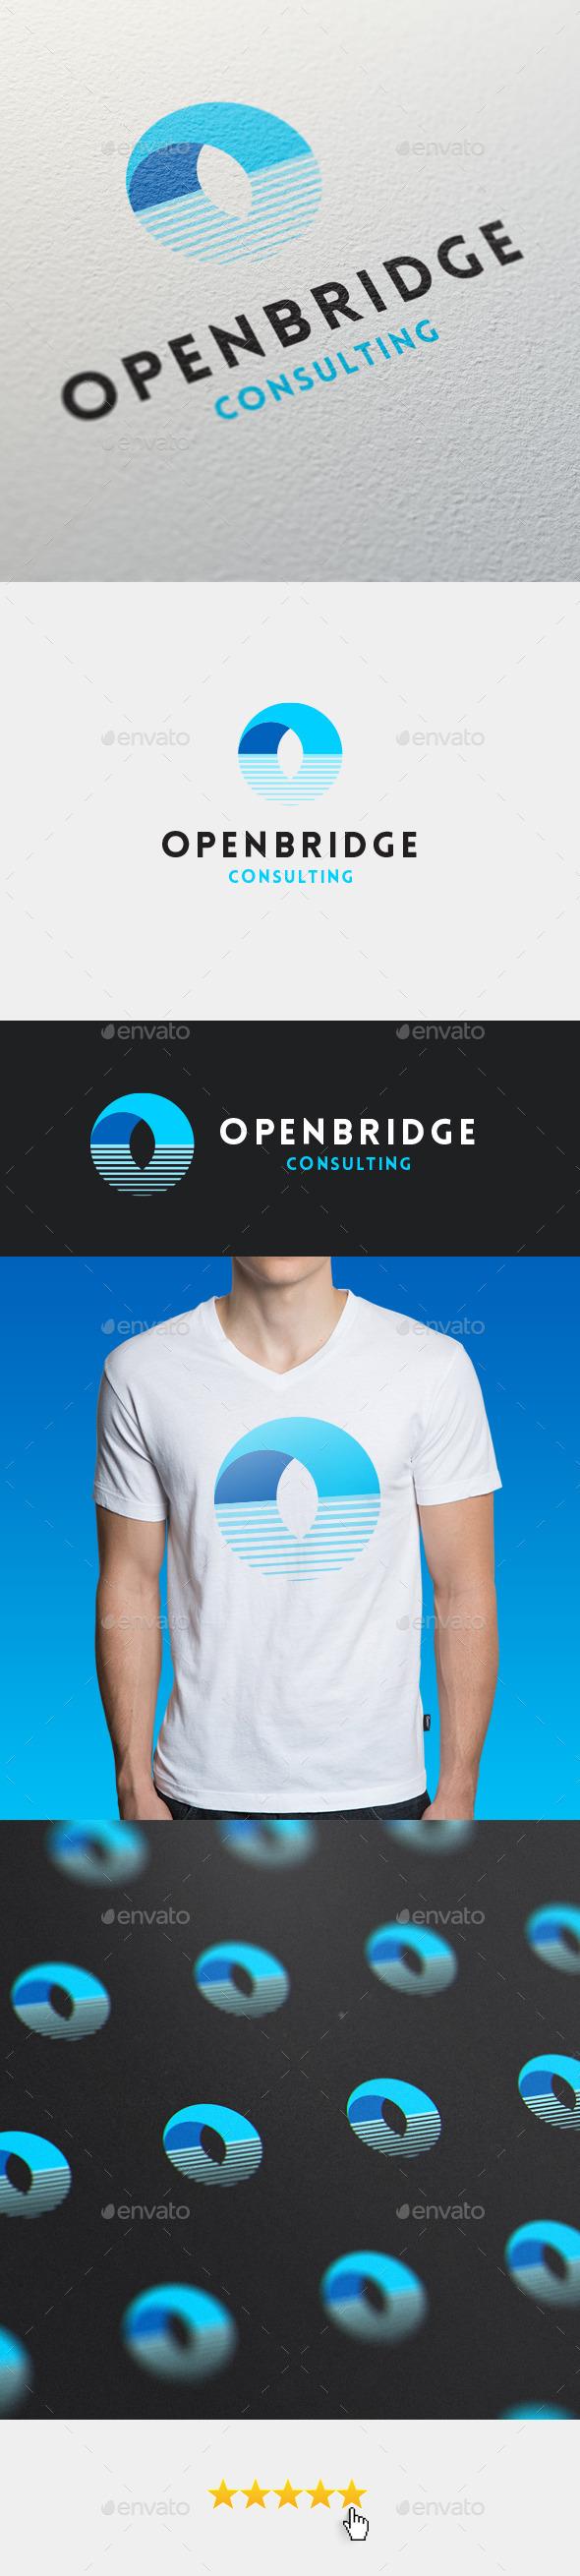 Openbridge Logo Template